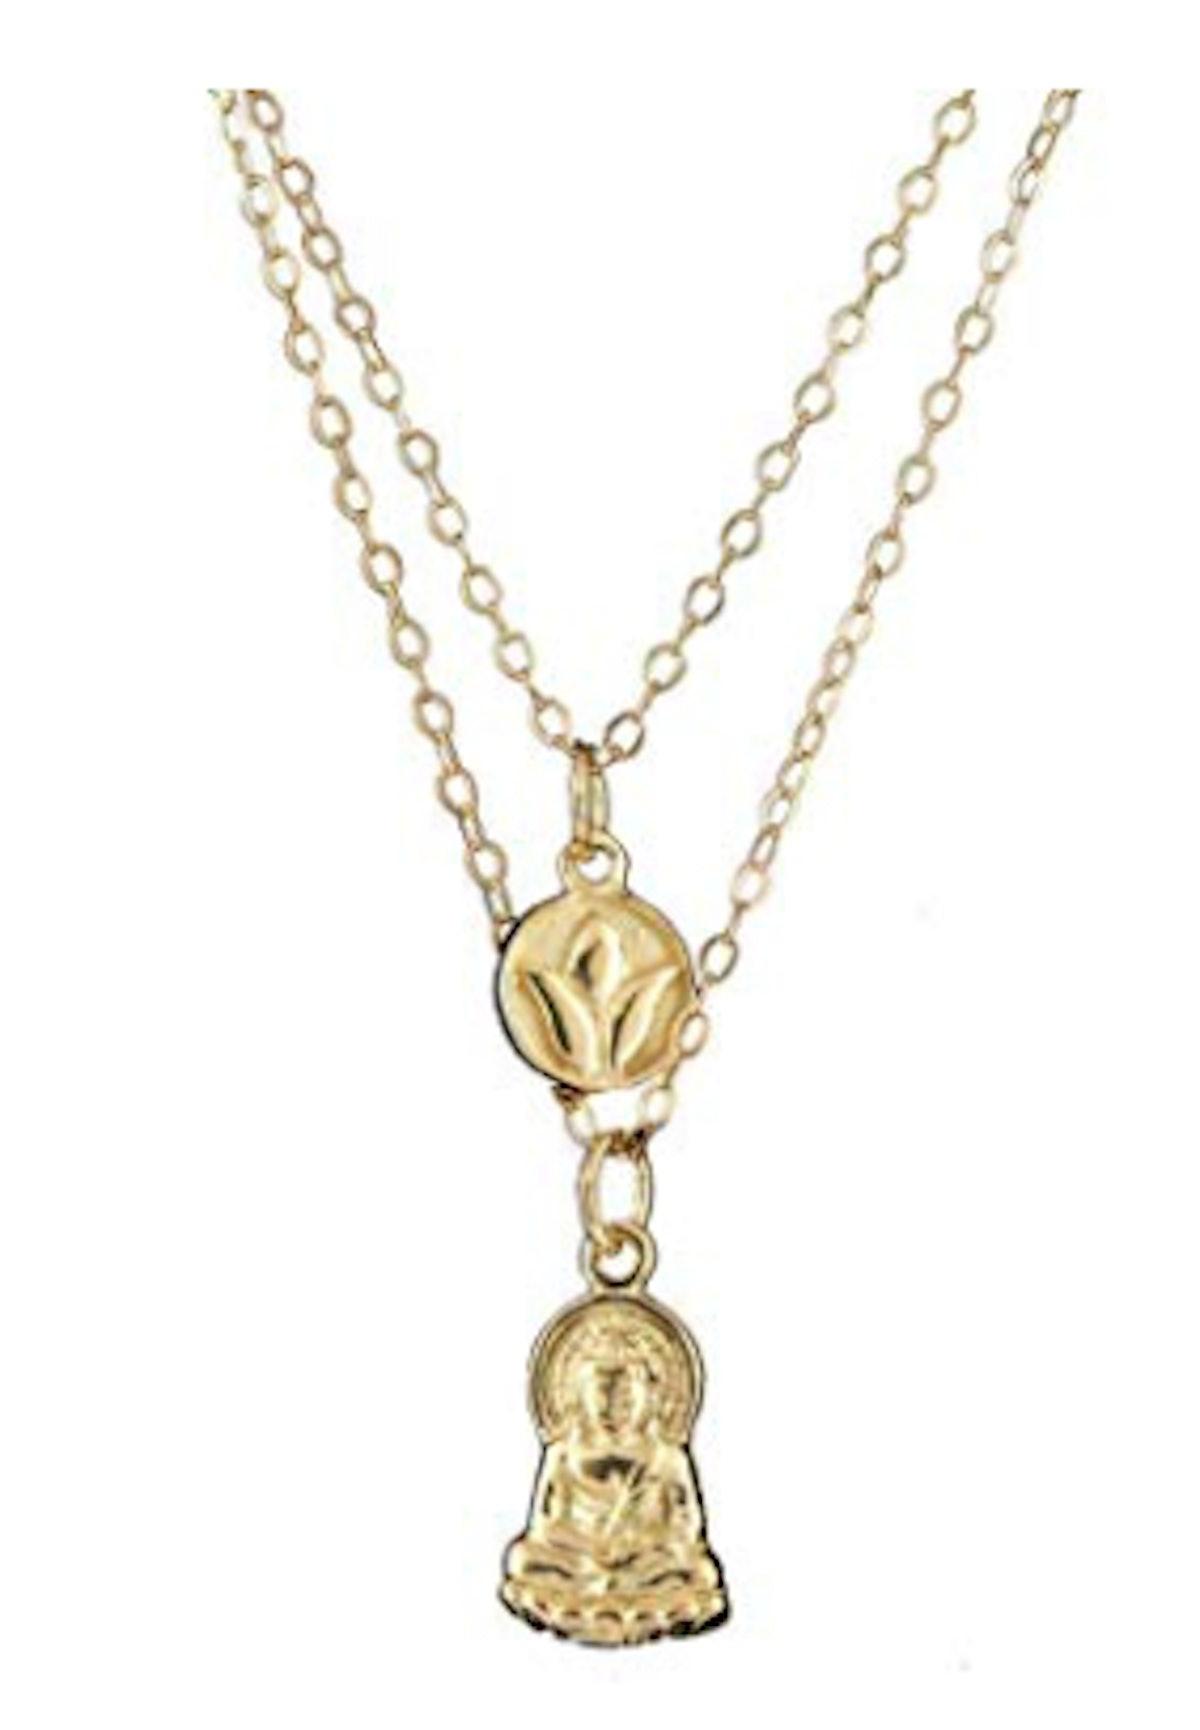 Lotus Bud and Buddha Charm Pendants on Layered 16 and 18 inch chains